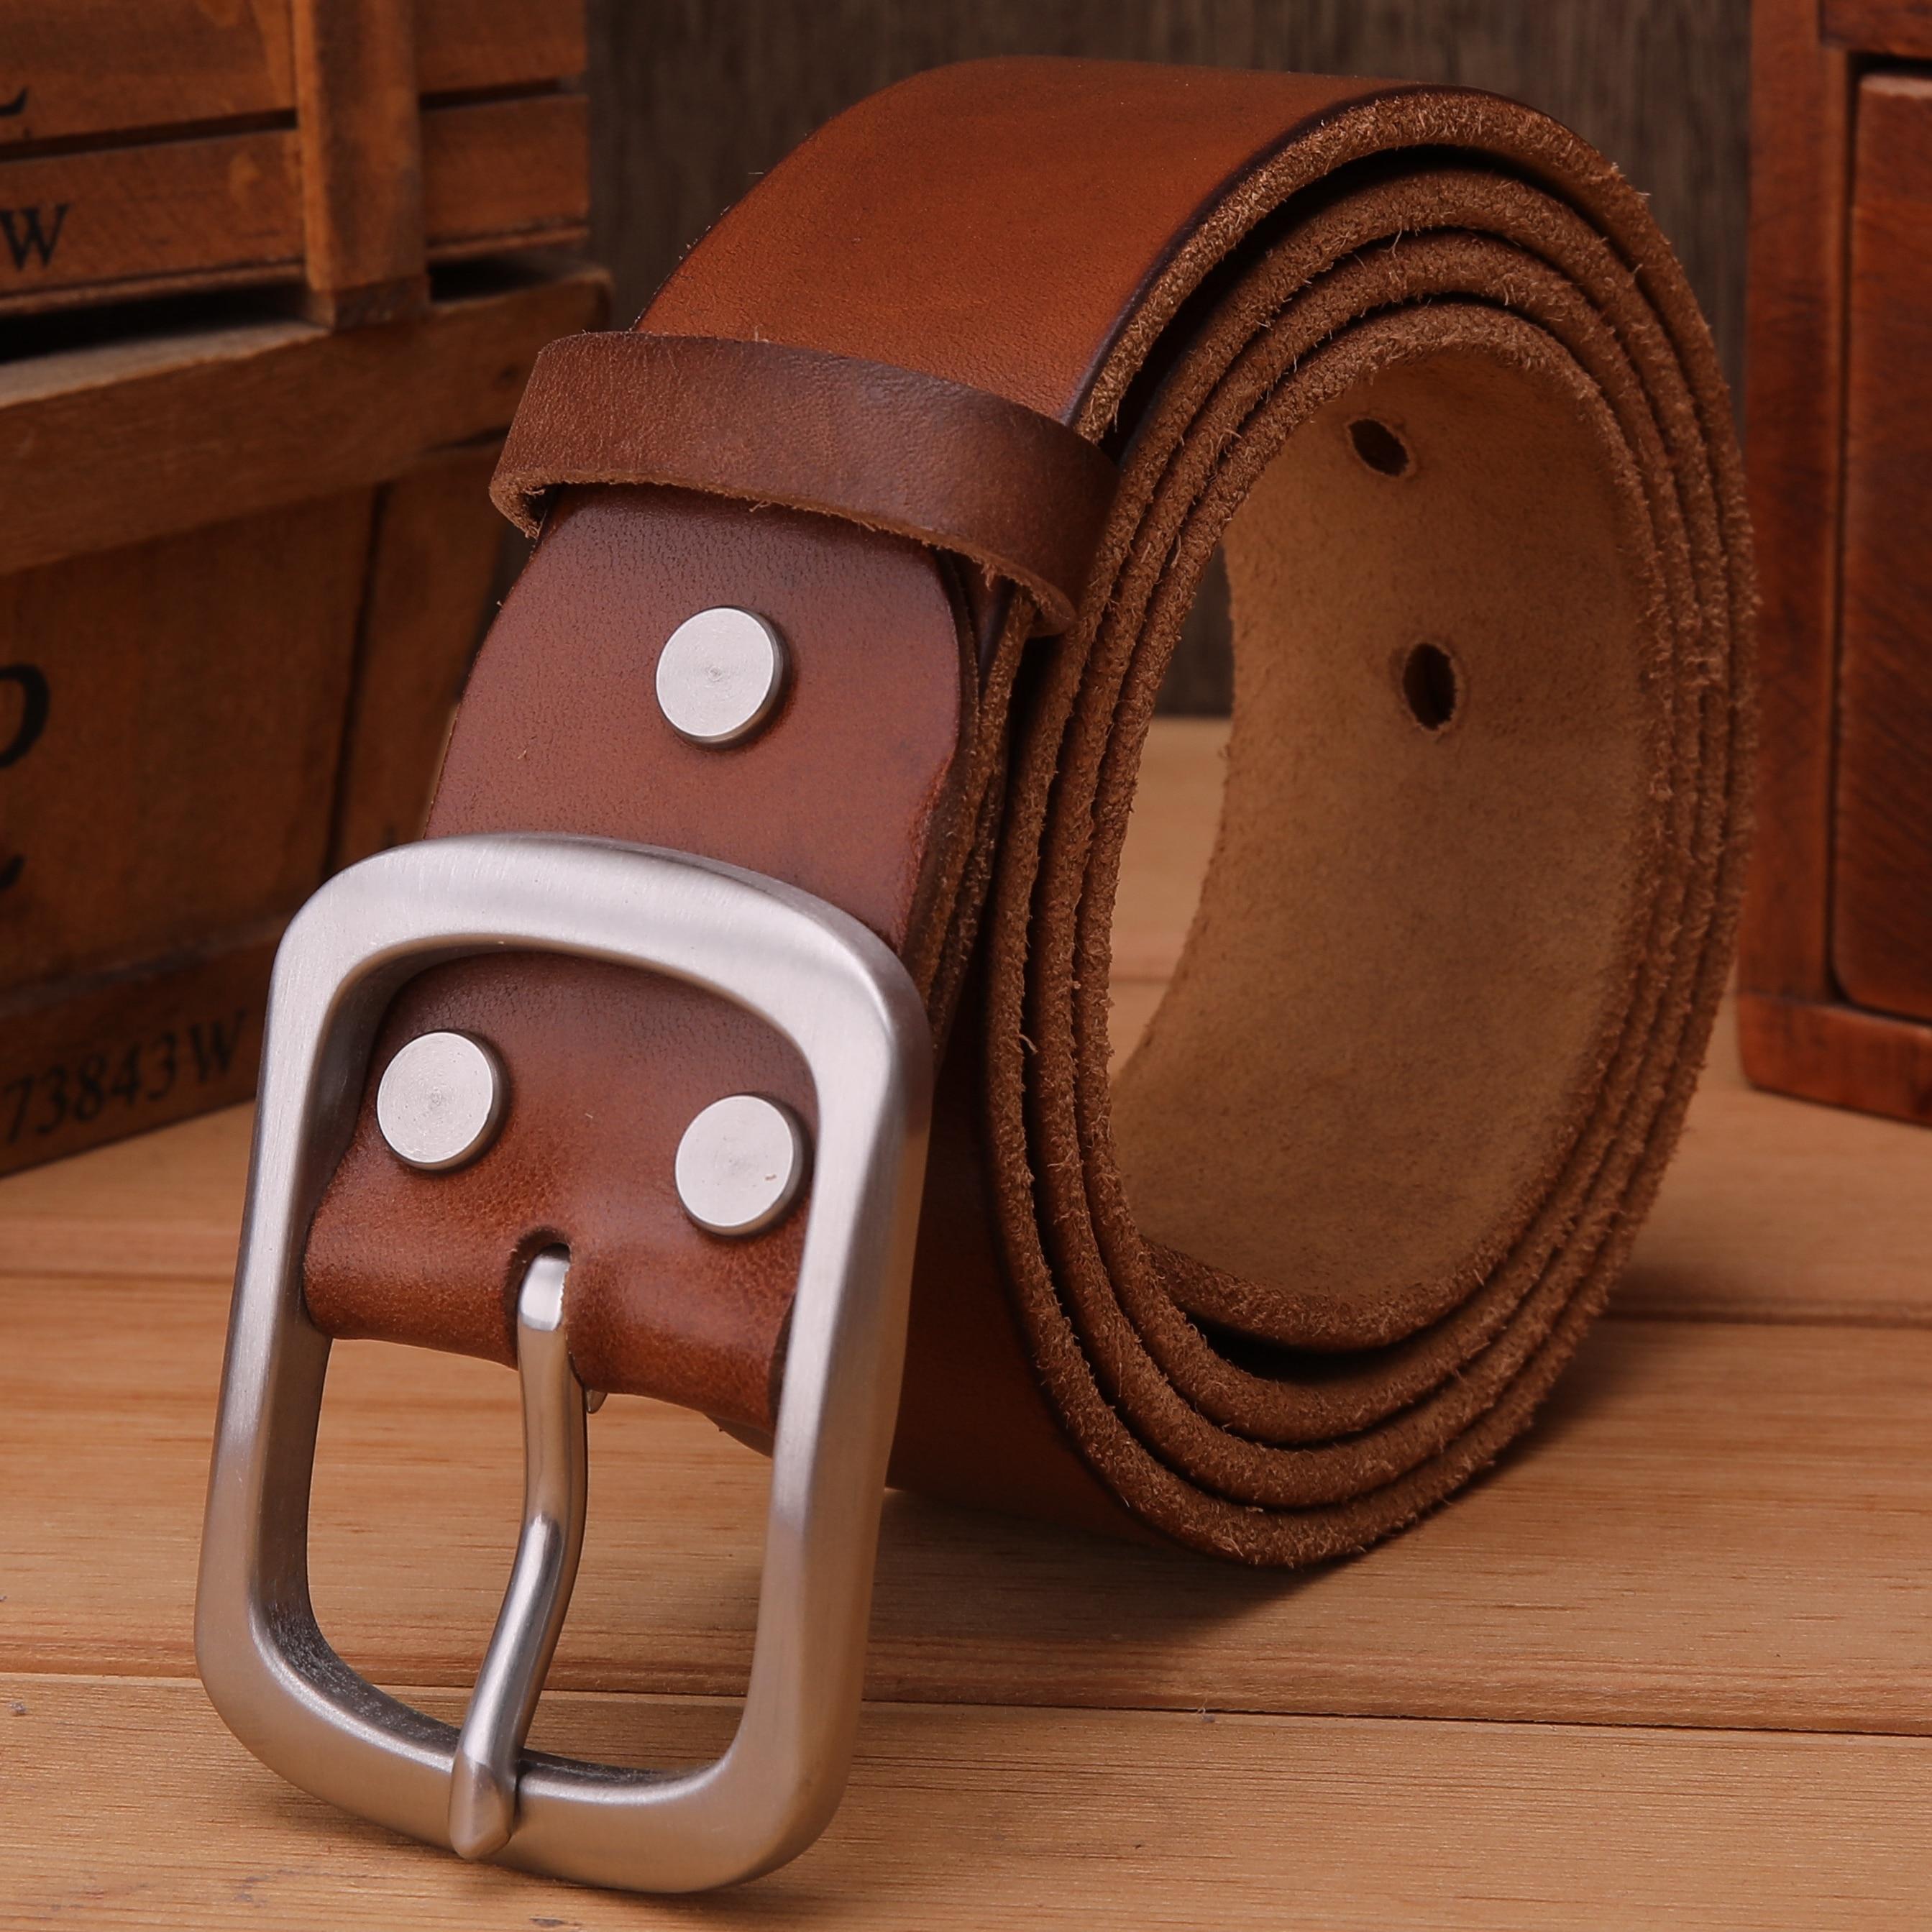 2019 Stainless steel buckle belt for men belts luxury full grain  real 100% genuine leather designer belt men high quality soft-in Men's Belts from Apparel Accessories